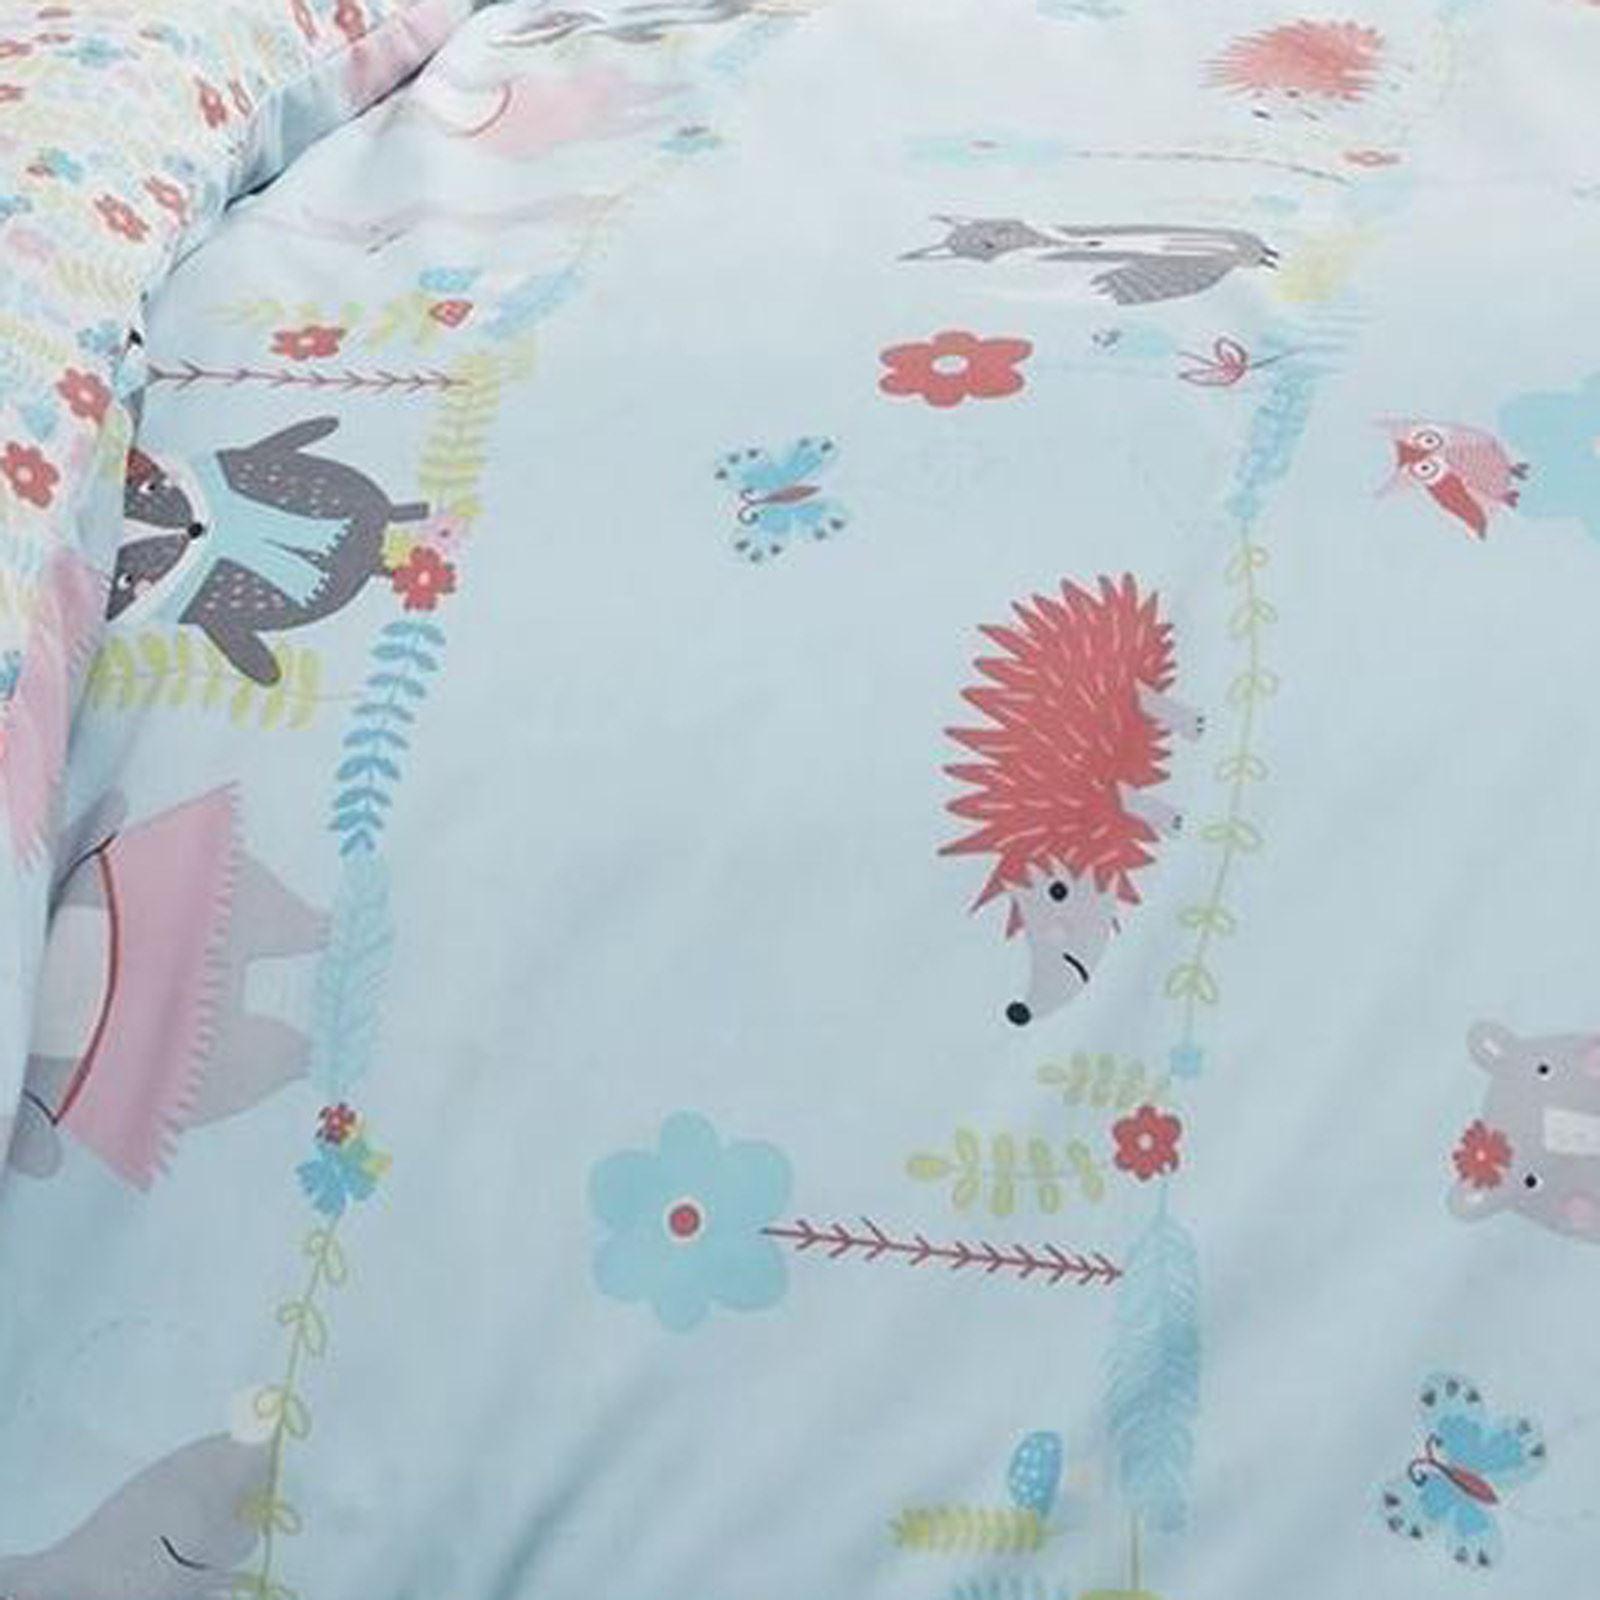 Kids-Duvet-Covers-Blue-Woodland-Animals-Cute-Reversible-Print-Quilt-Bedding-Sets thumbnail 9